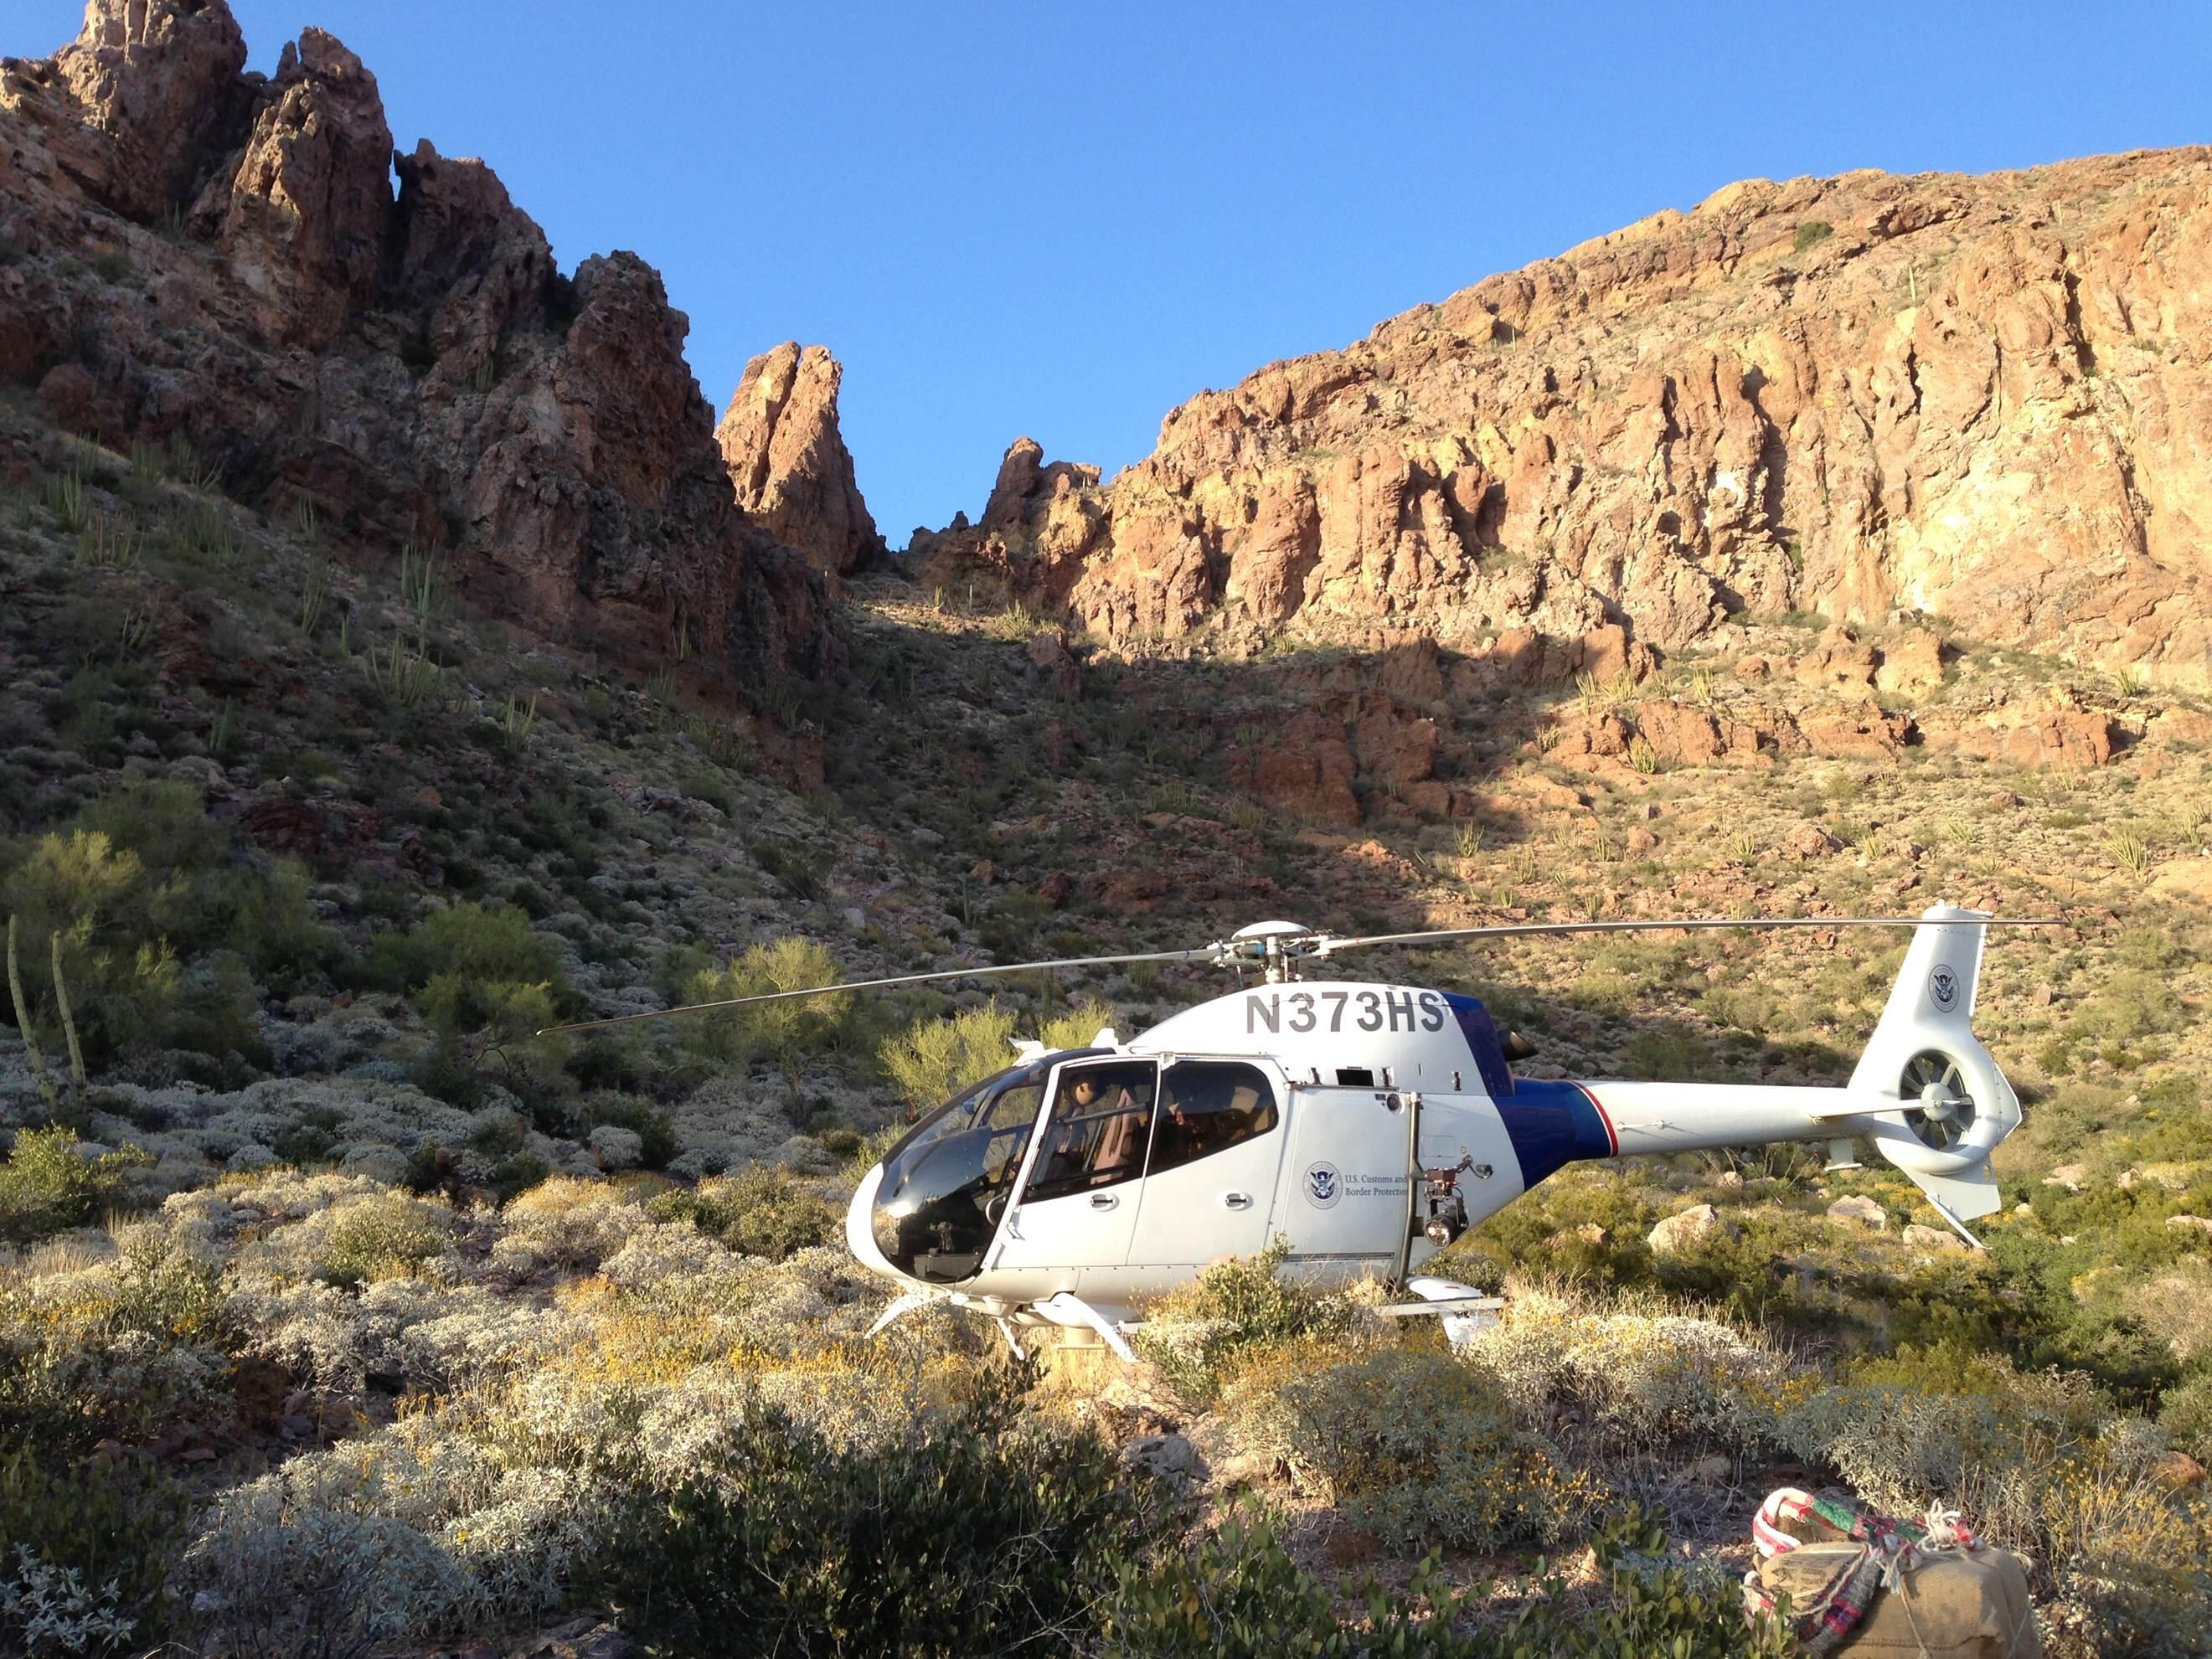 An Air and Marine Operations EC120 crew lands in the desert to retrieve bundles of marijuana near Yuma, Arizona.